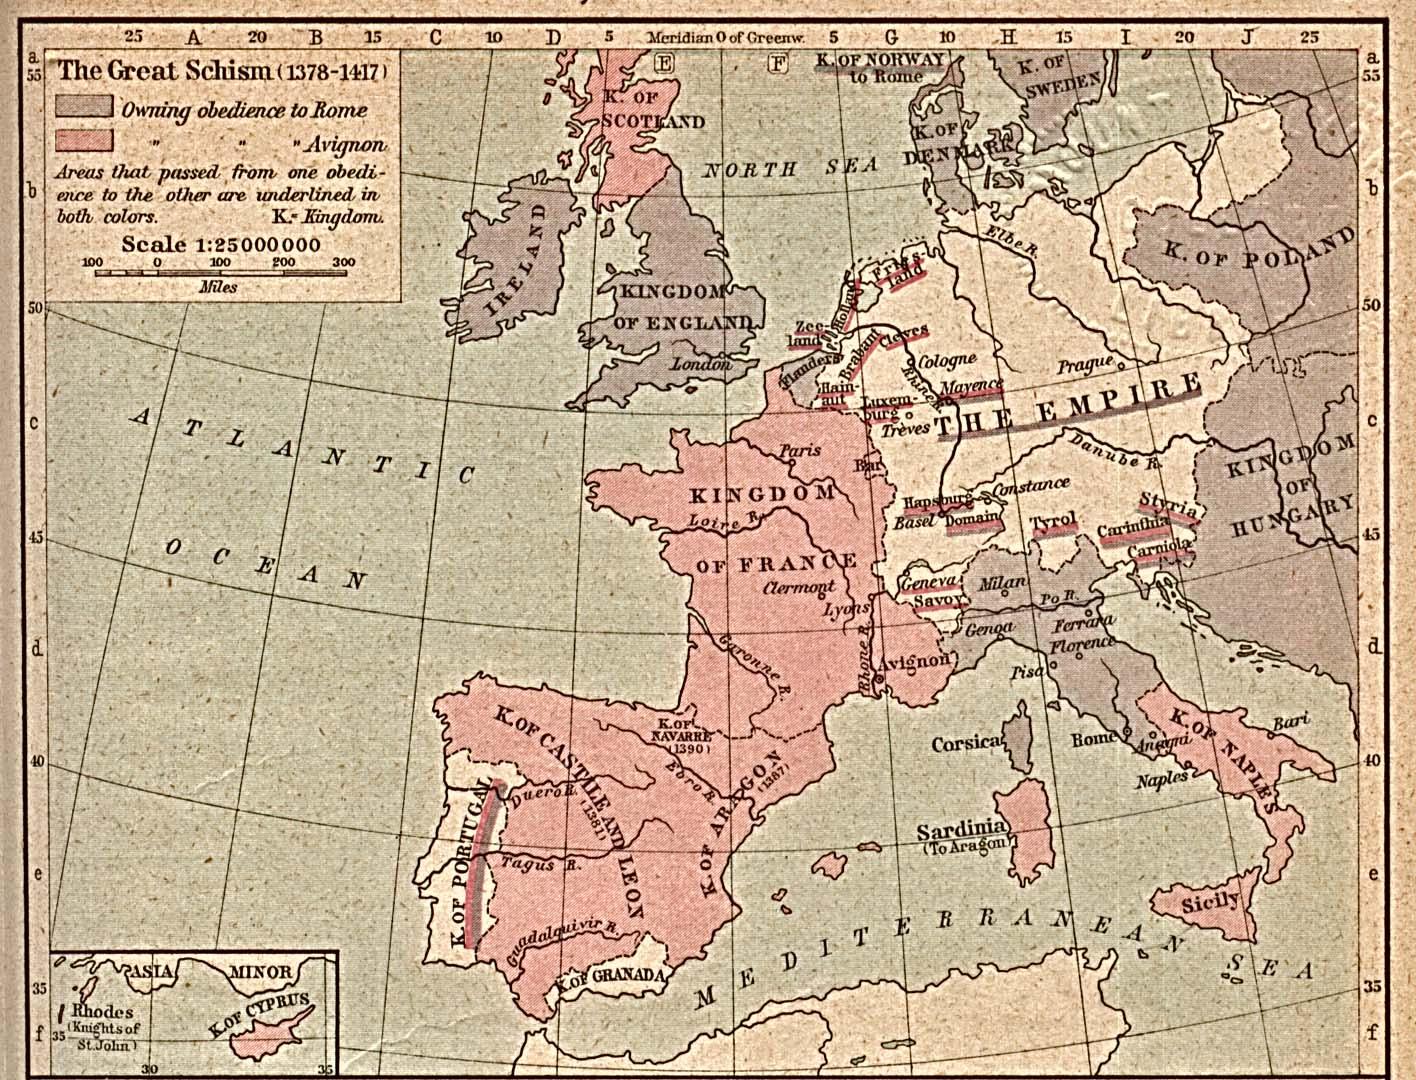 Gran Cisma del Cristianismo en Occidente 1378-1417